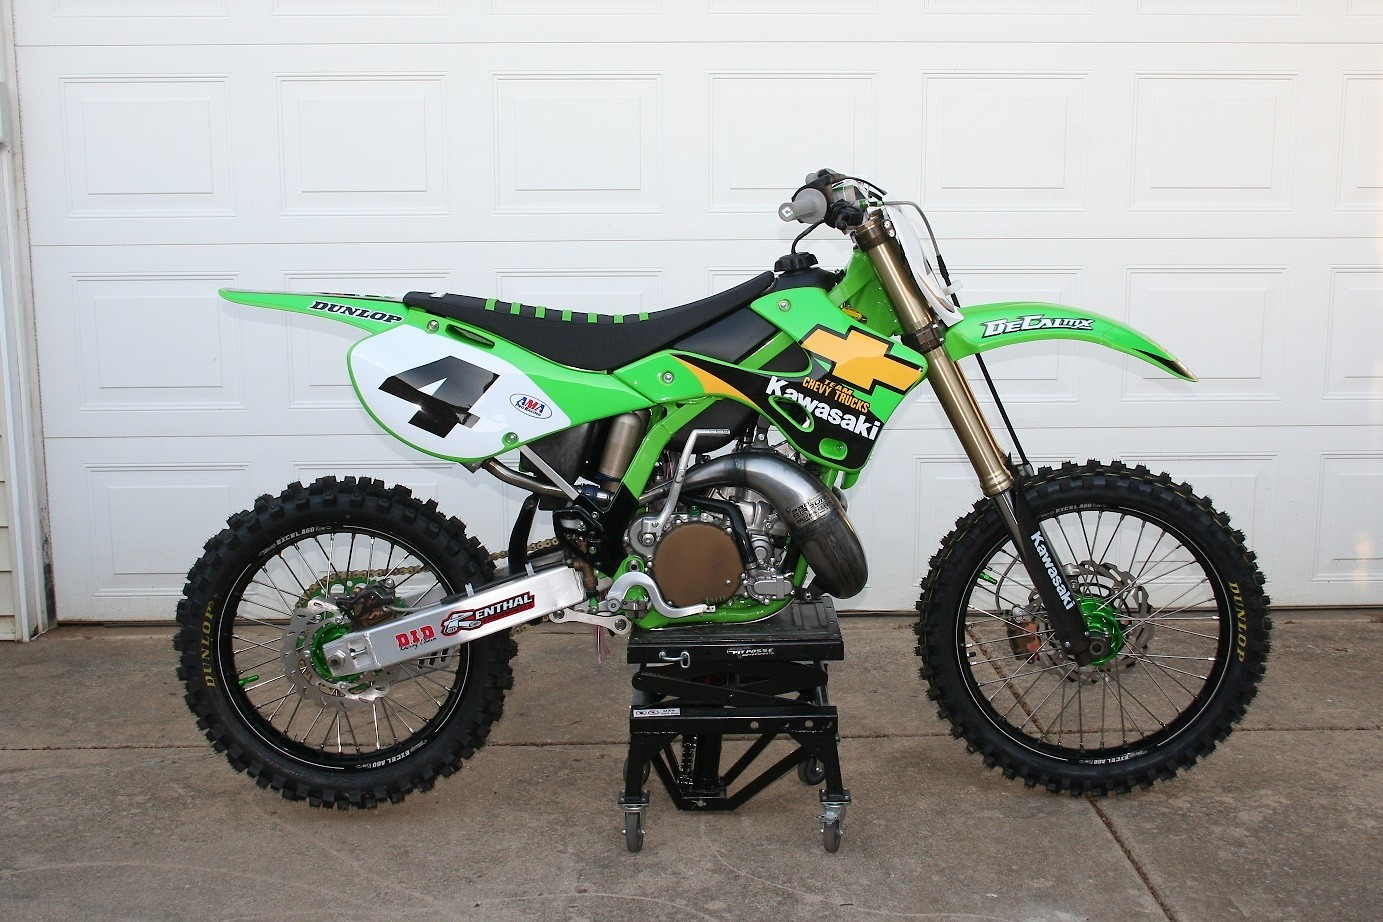 KX250 4 - Cadpro18 - Motocross Pictures - Vital MX